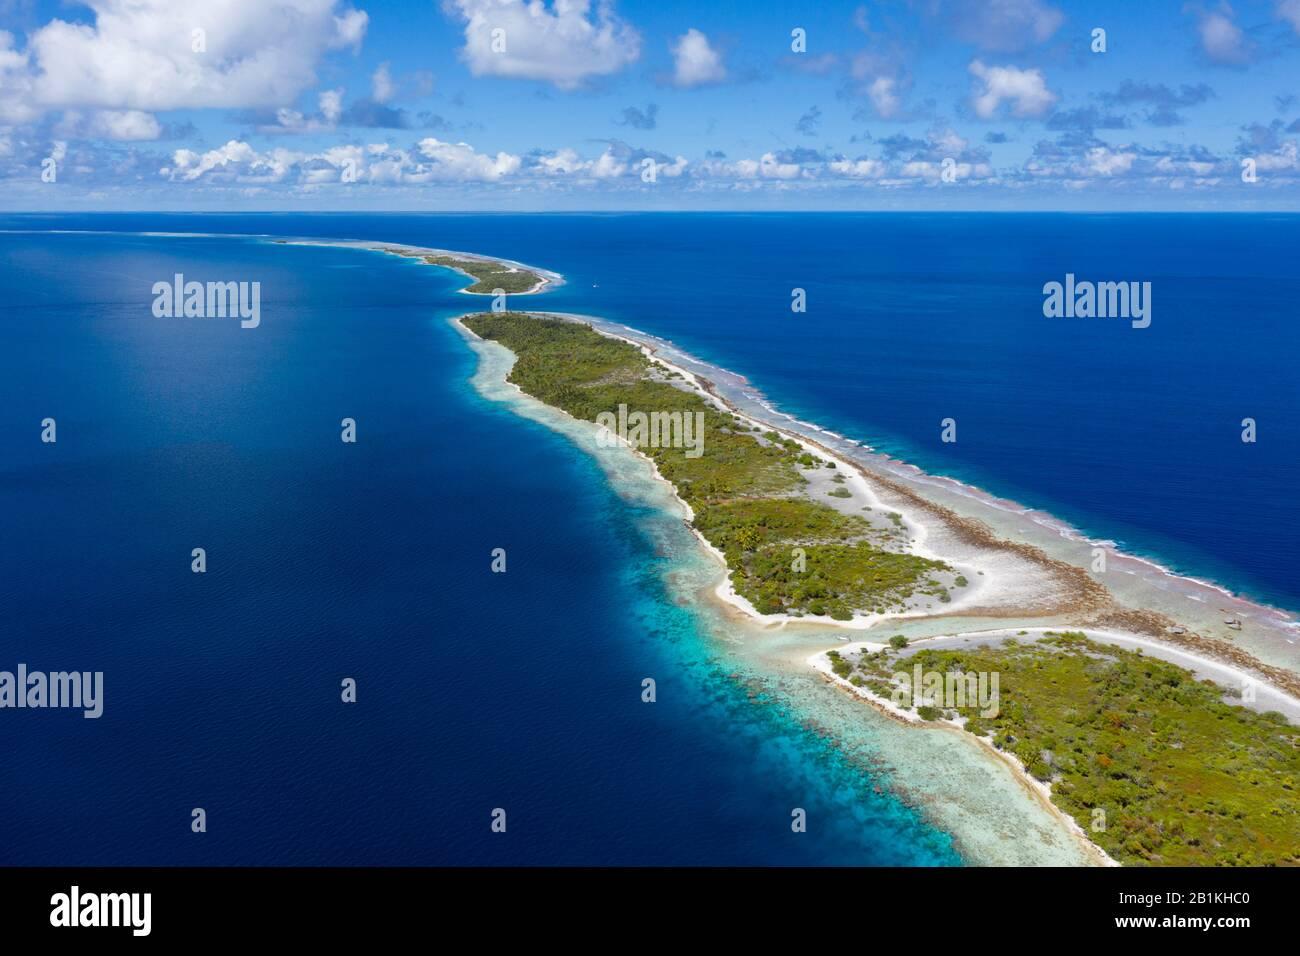 Impressions of Kauehi Atoll, Tuamotu Archipel, French Polynesia Stock Photo